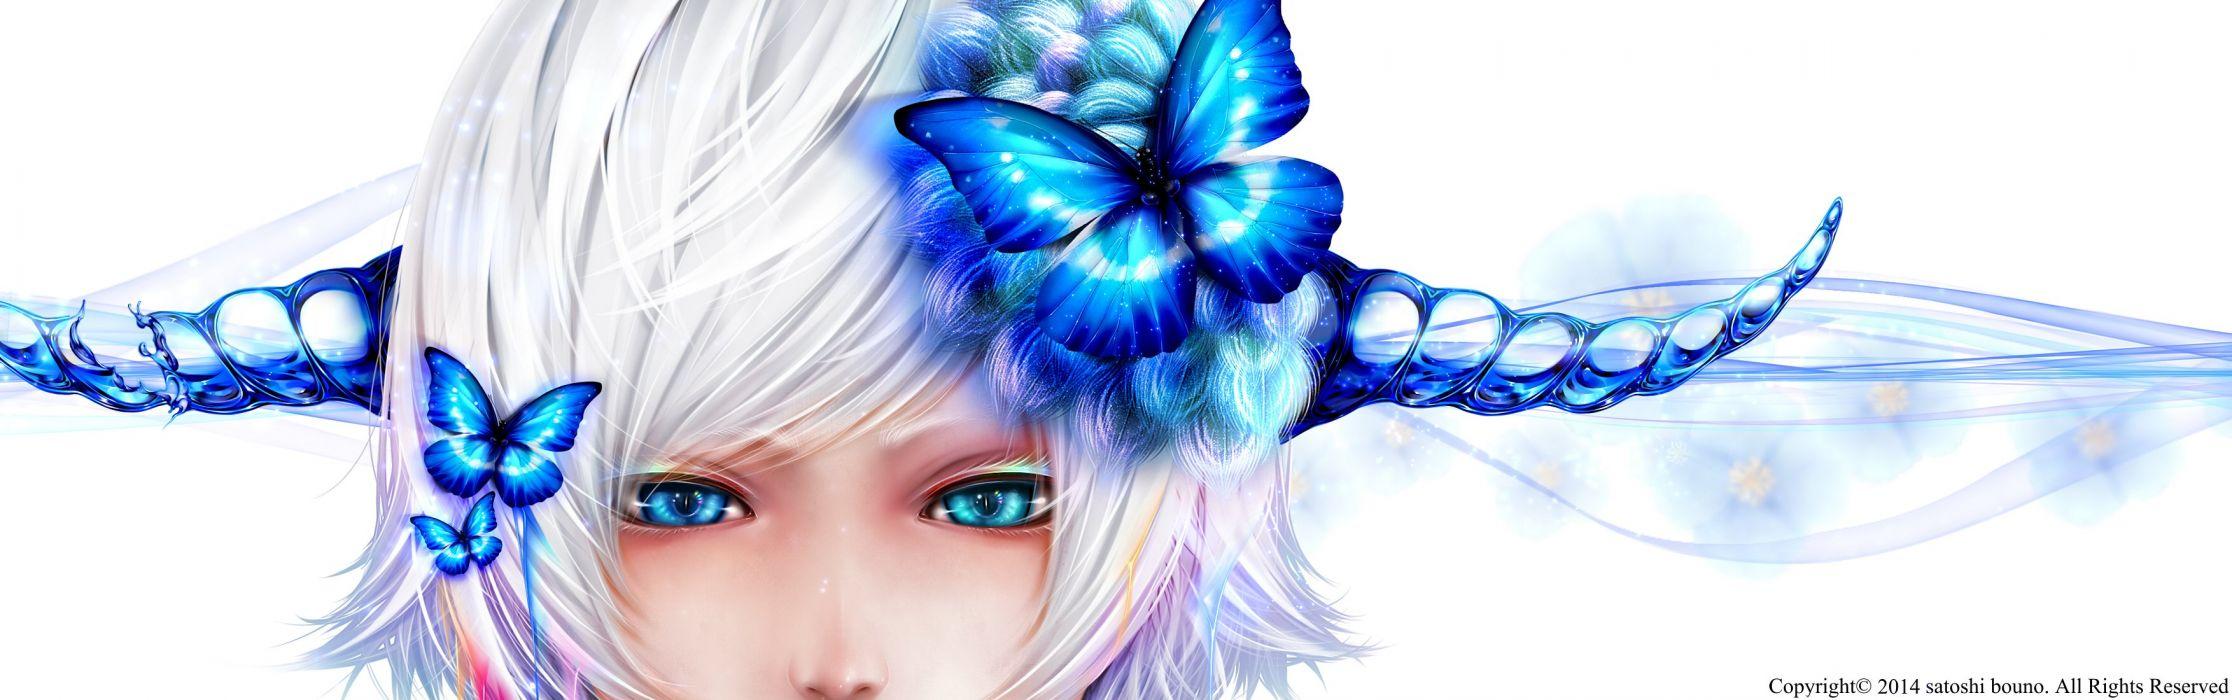 bicolored eyes blue eyes bouno satoshi butterfly flowers horns original short hair watermark white hair wallpaper